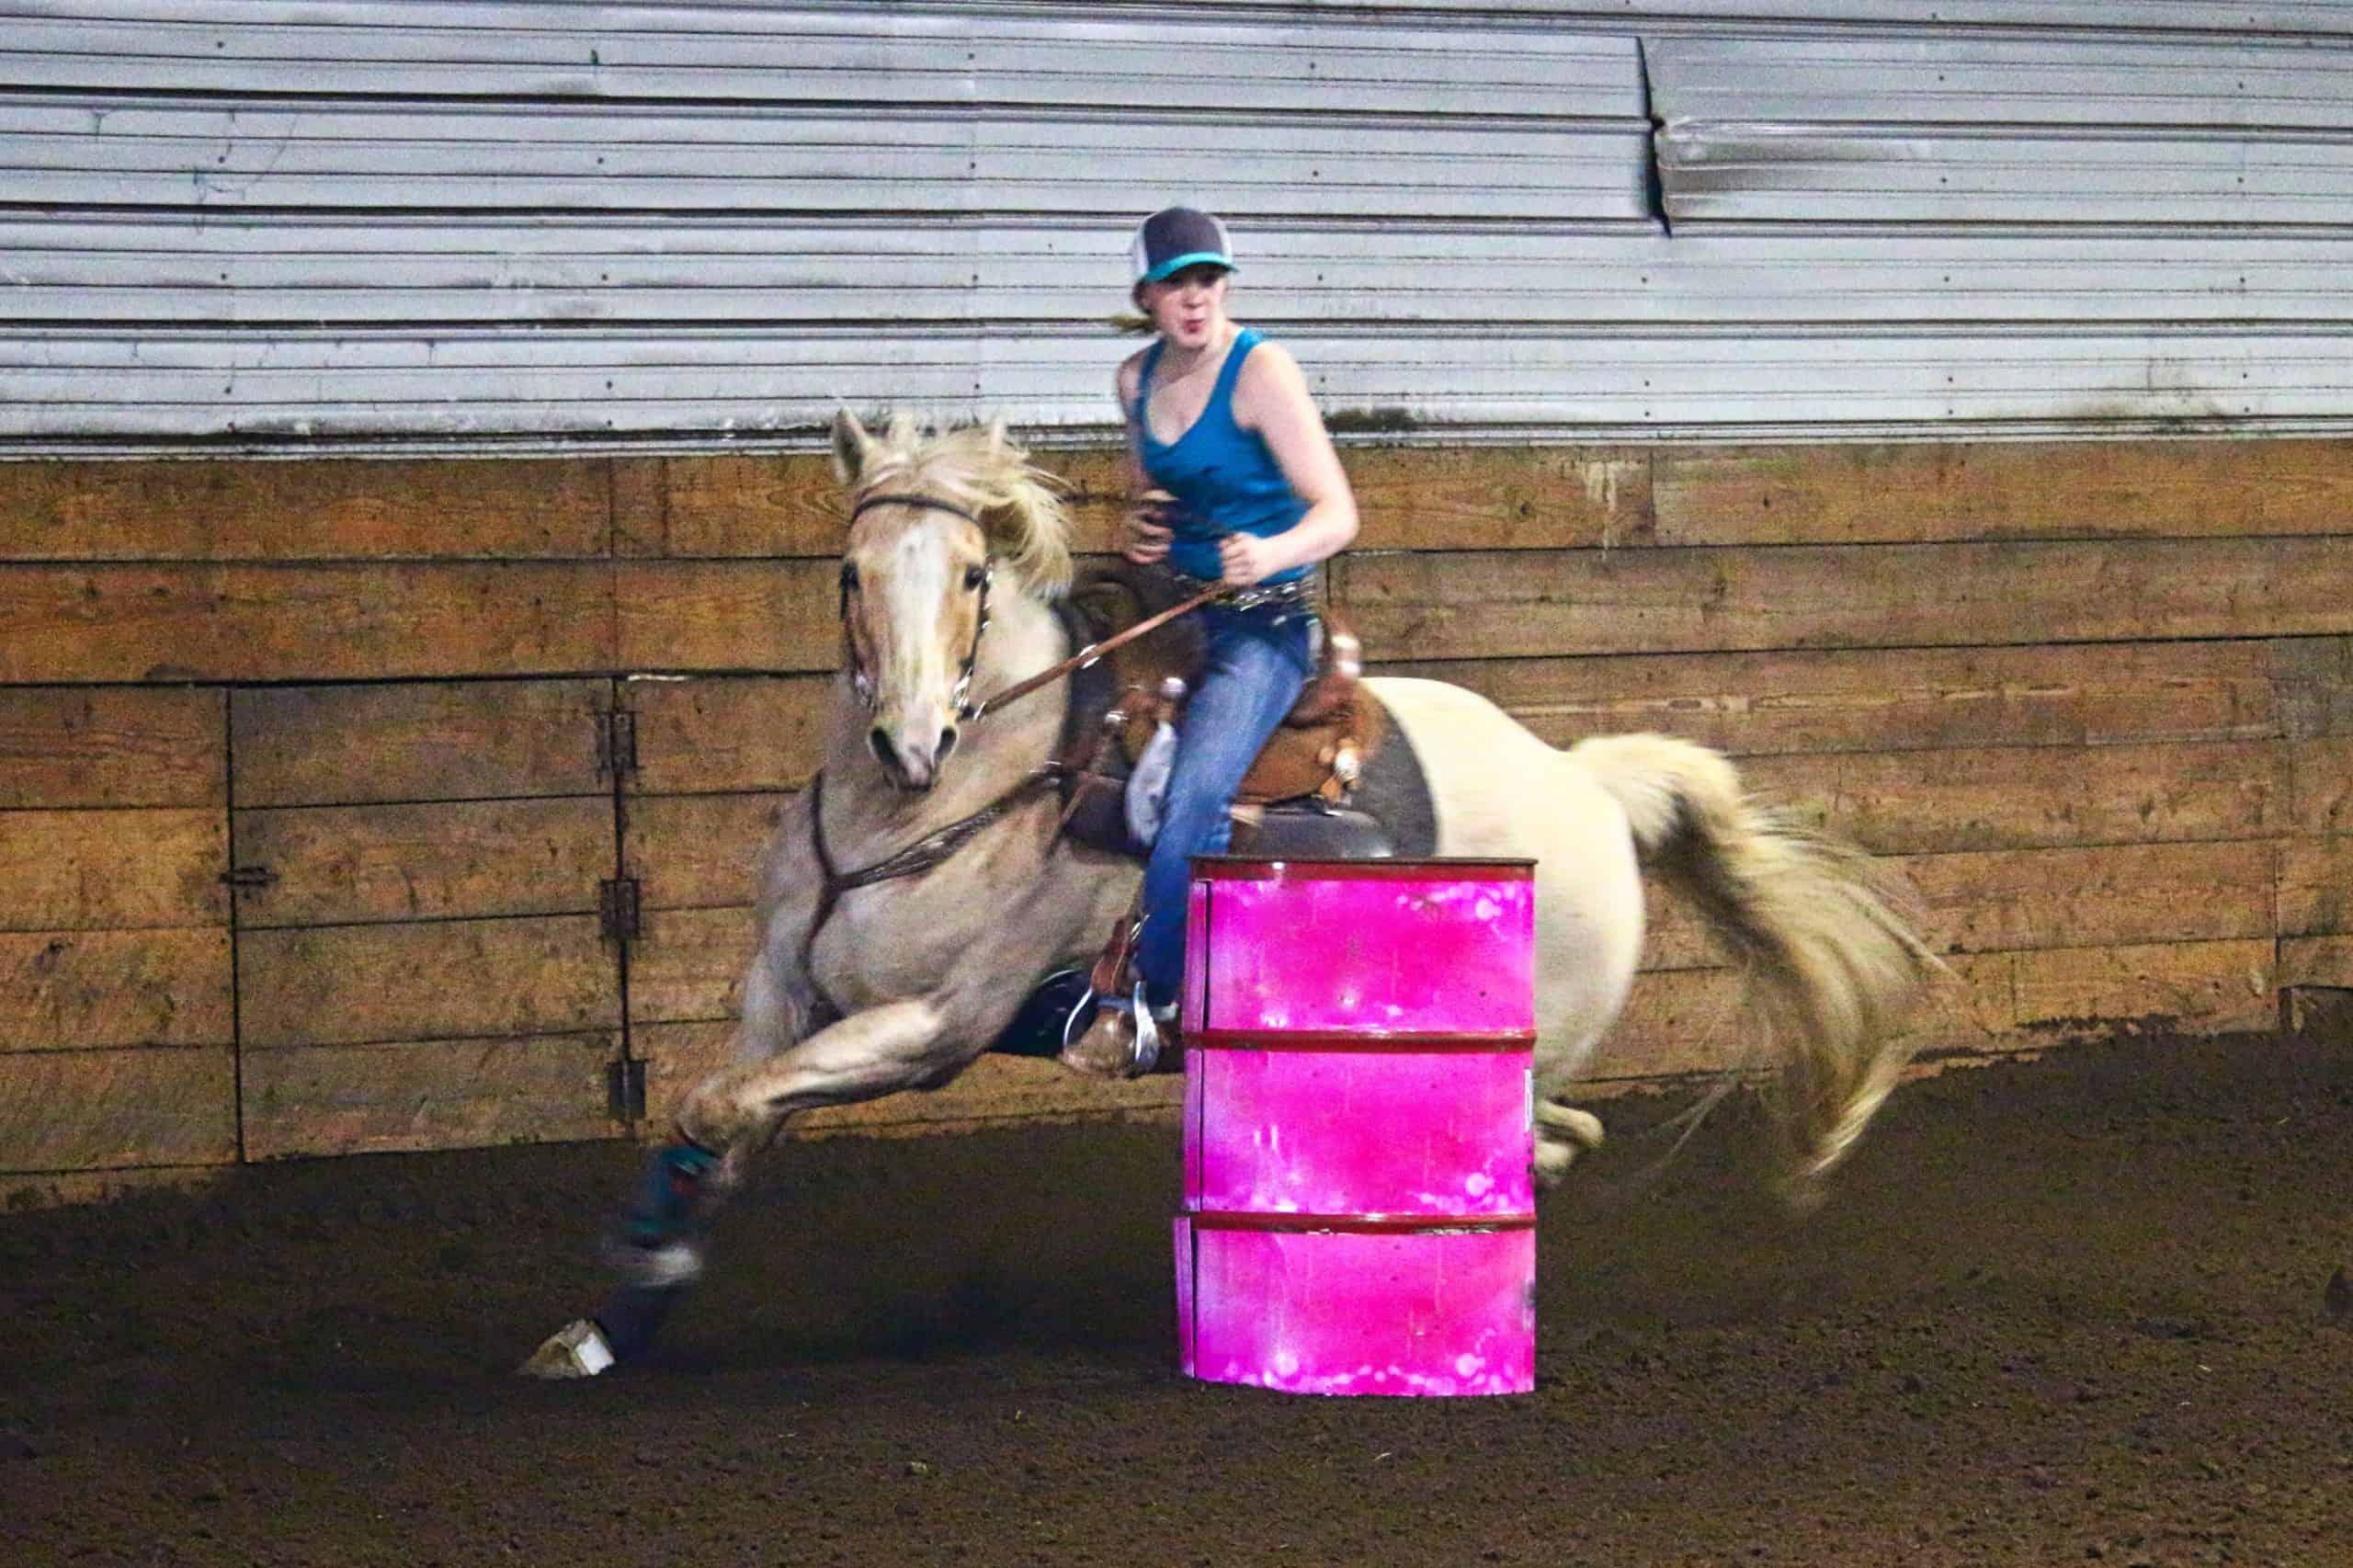 Barrel racing indoors on palomino horse around pink barrel